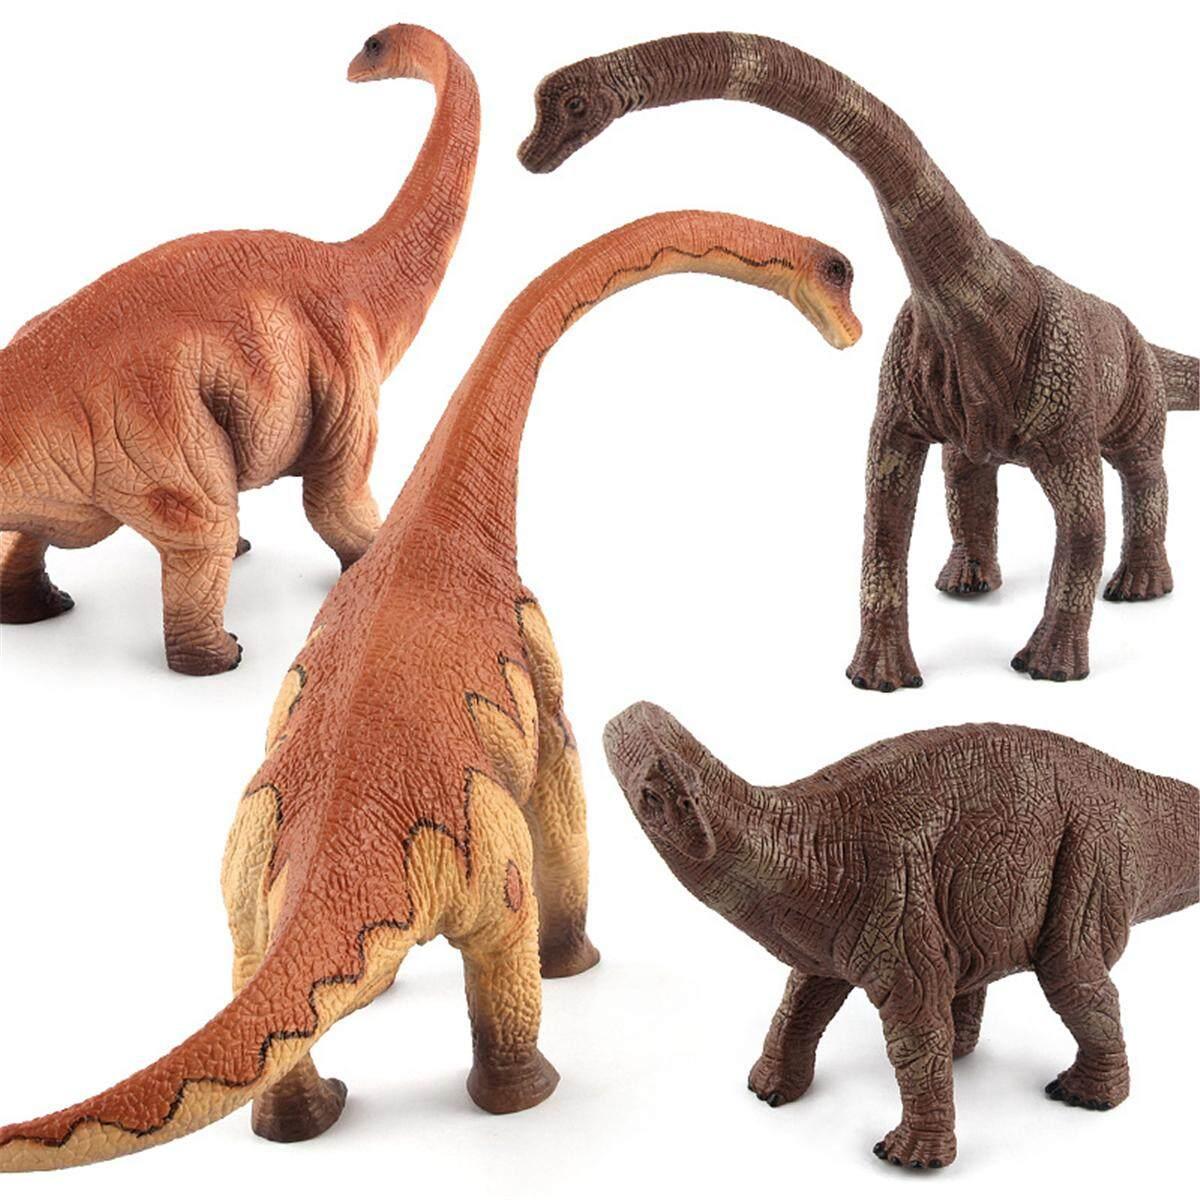 2018 Large Brachiosaurus Dinosaur Toy Realistic Solid Plastic Model GIFT to Kids